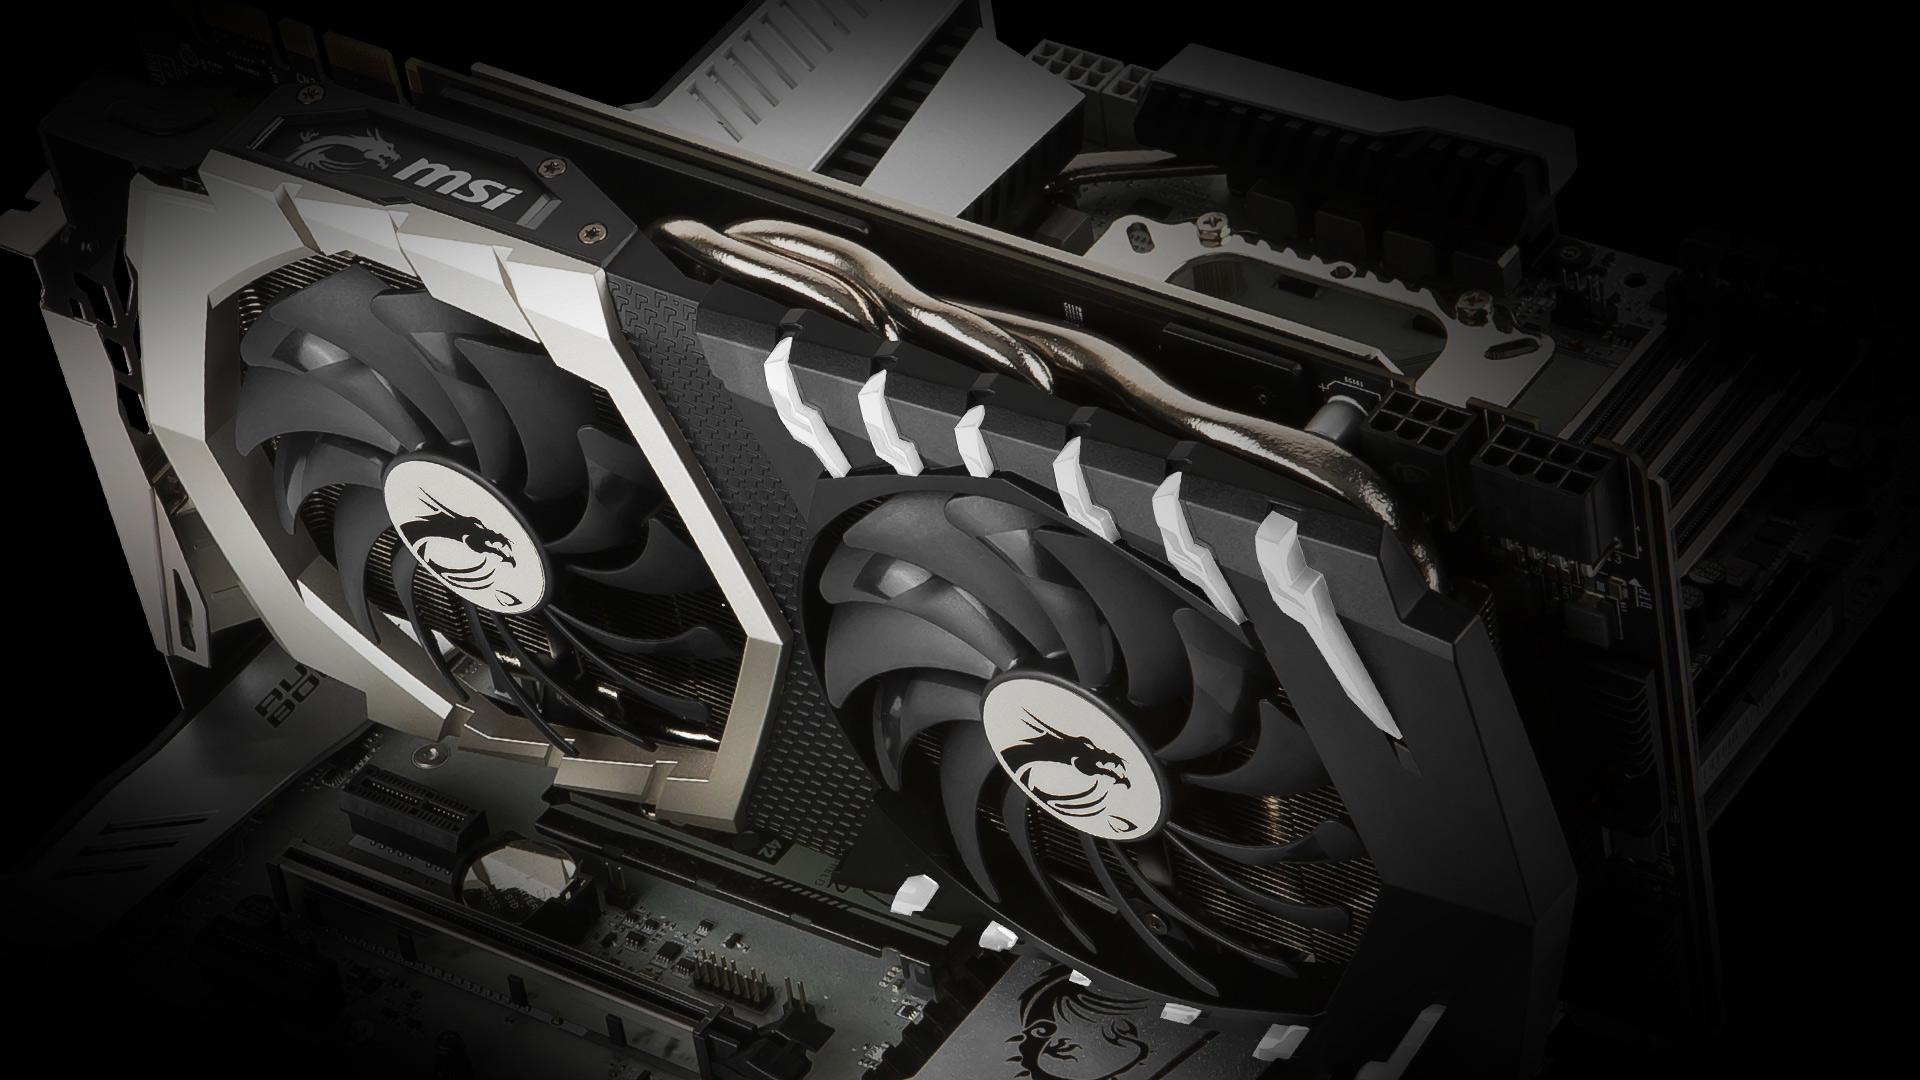 https://asset.msi.com/global/picture/image/feature/vga/NVIDIA/GTX1070Ti/1070_ti_titanium_ice.jpg